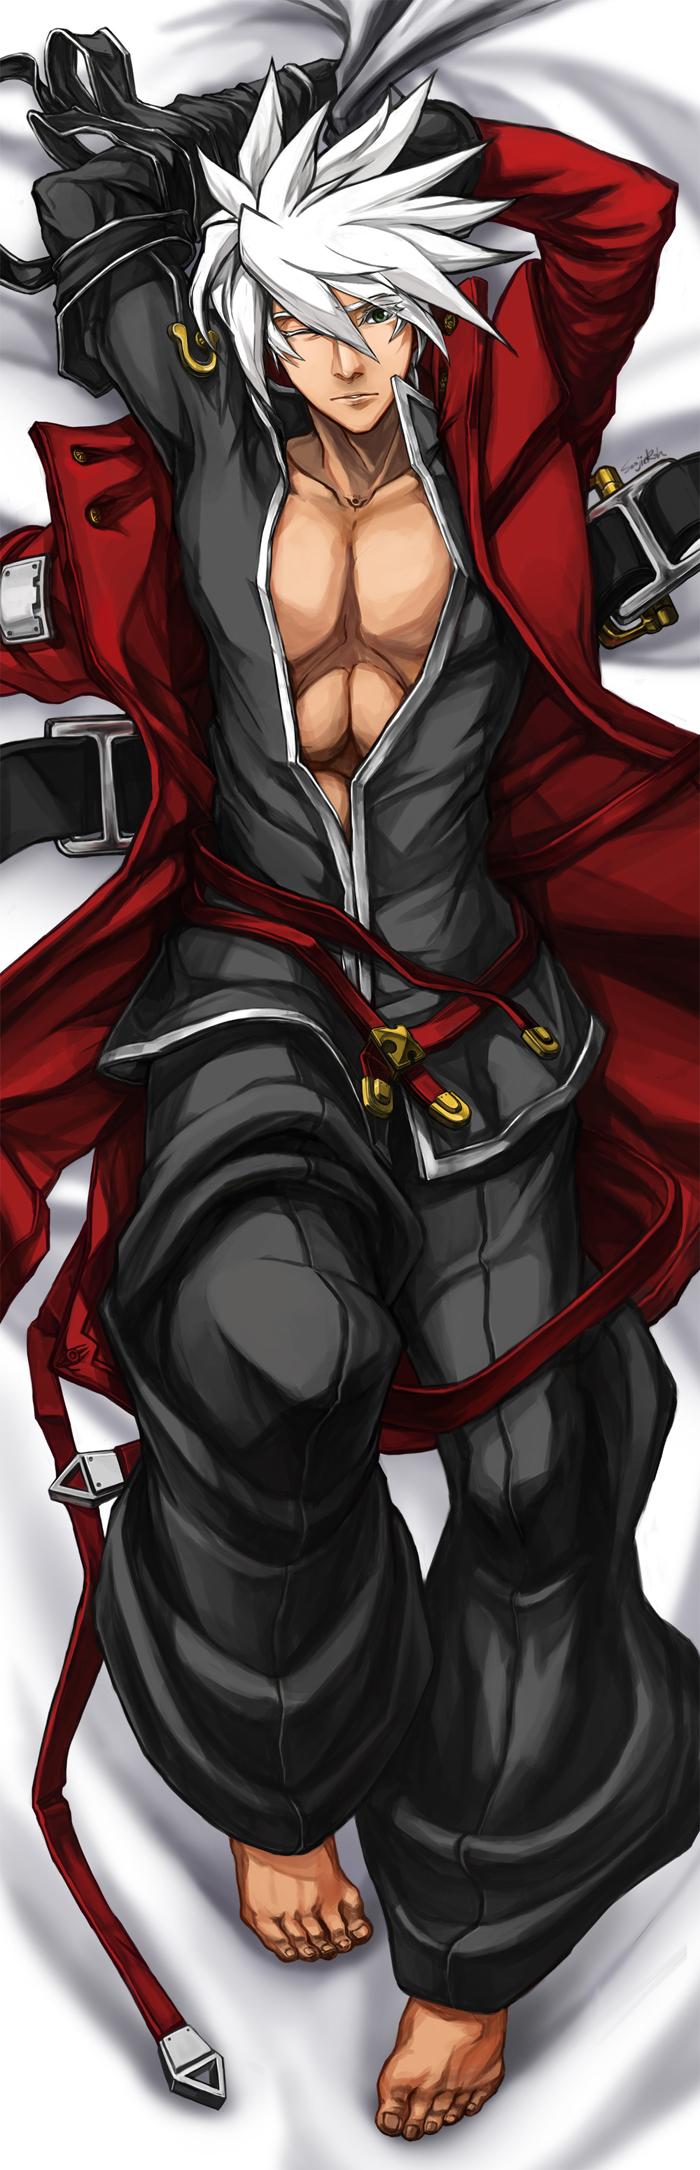 ragna the bloodedge (blazblue) drawn by soojie roh